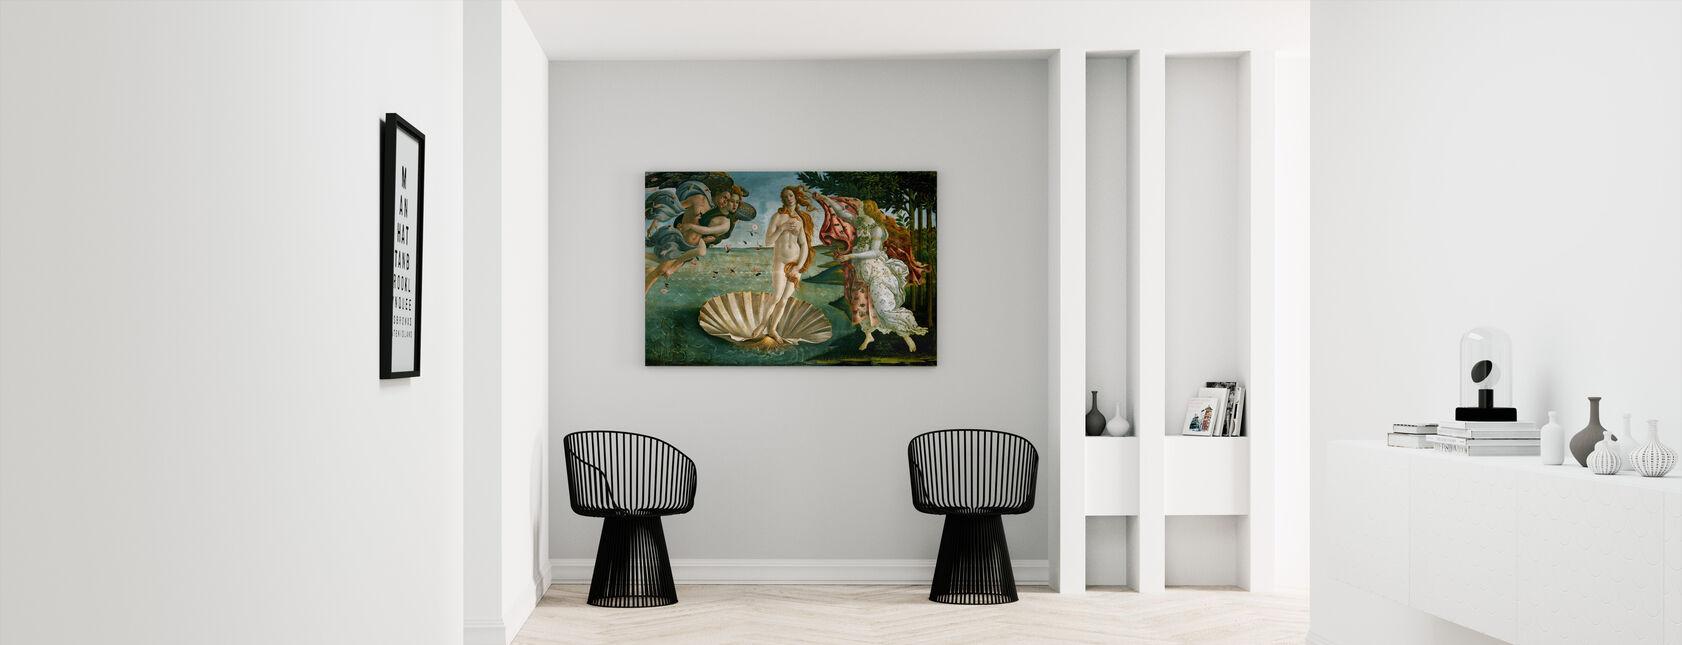 Sandro Botticelli - Birth of Venus - Canvas print - Hallway